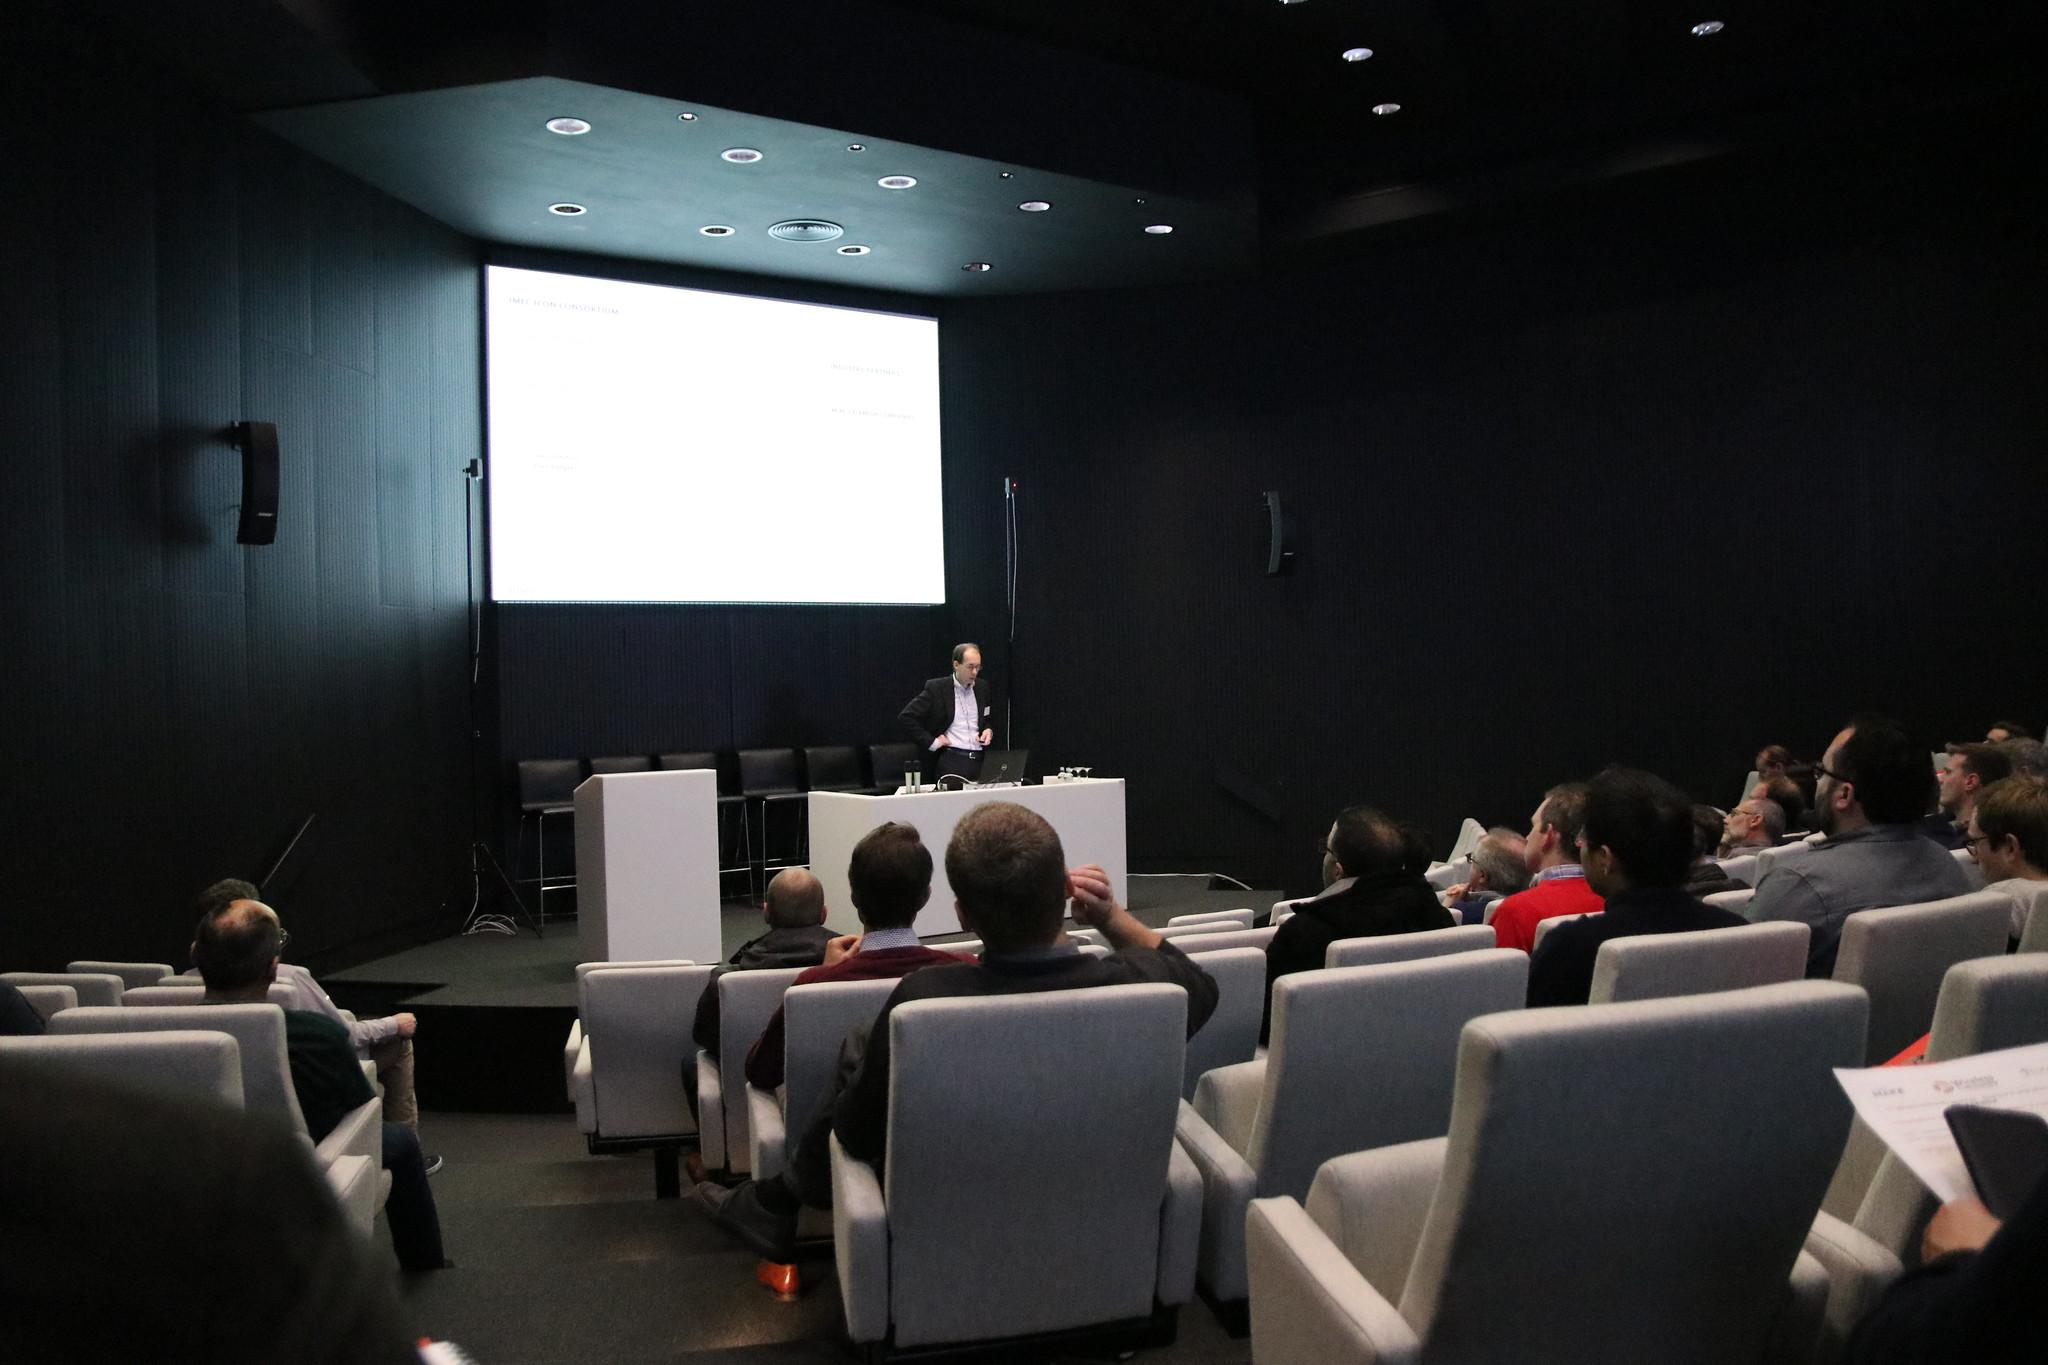 20191206 Wireless Community workshop @ Imec (Smart Connectivity)